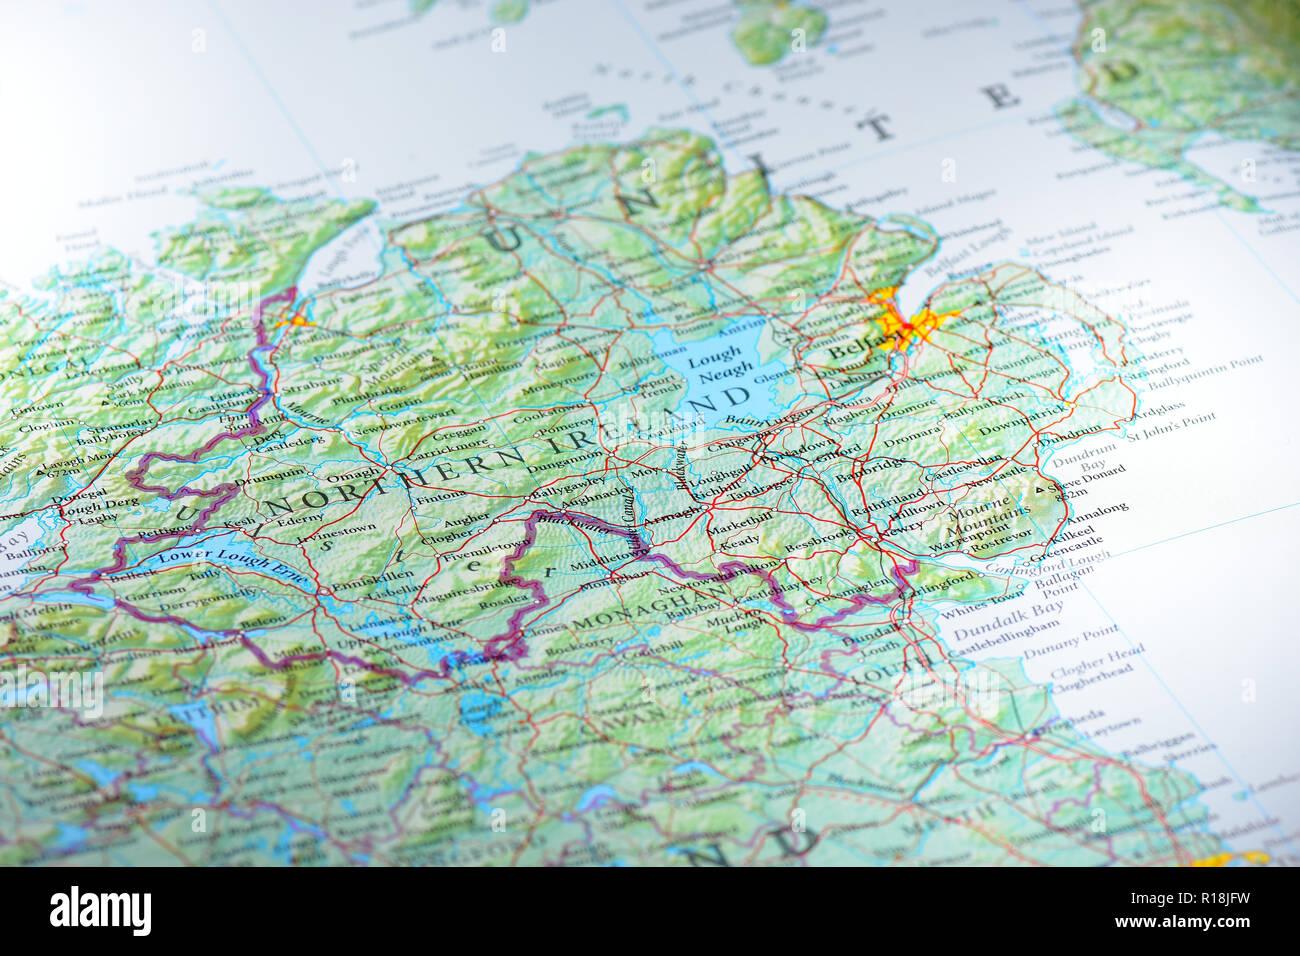 Map of Northern Ireland UK - Stock Image